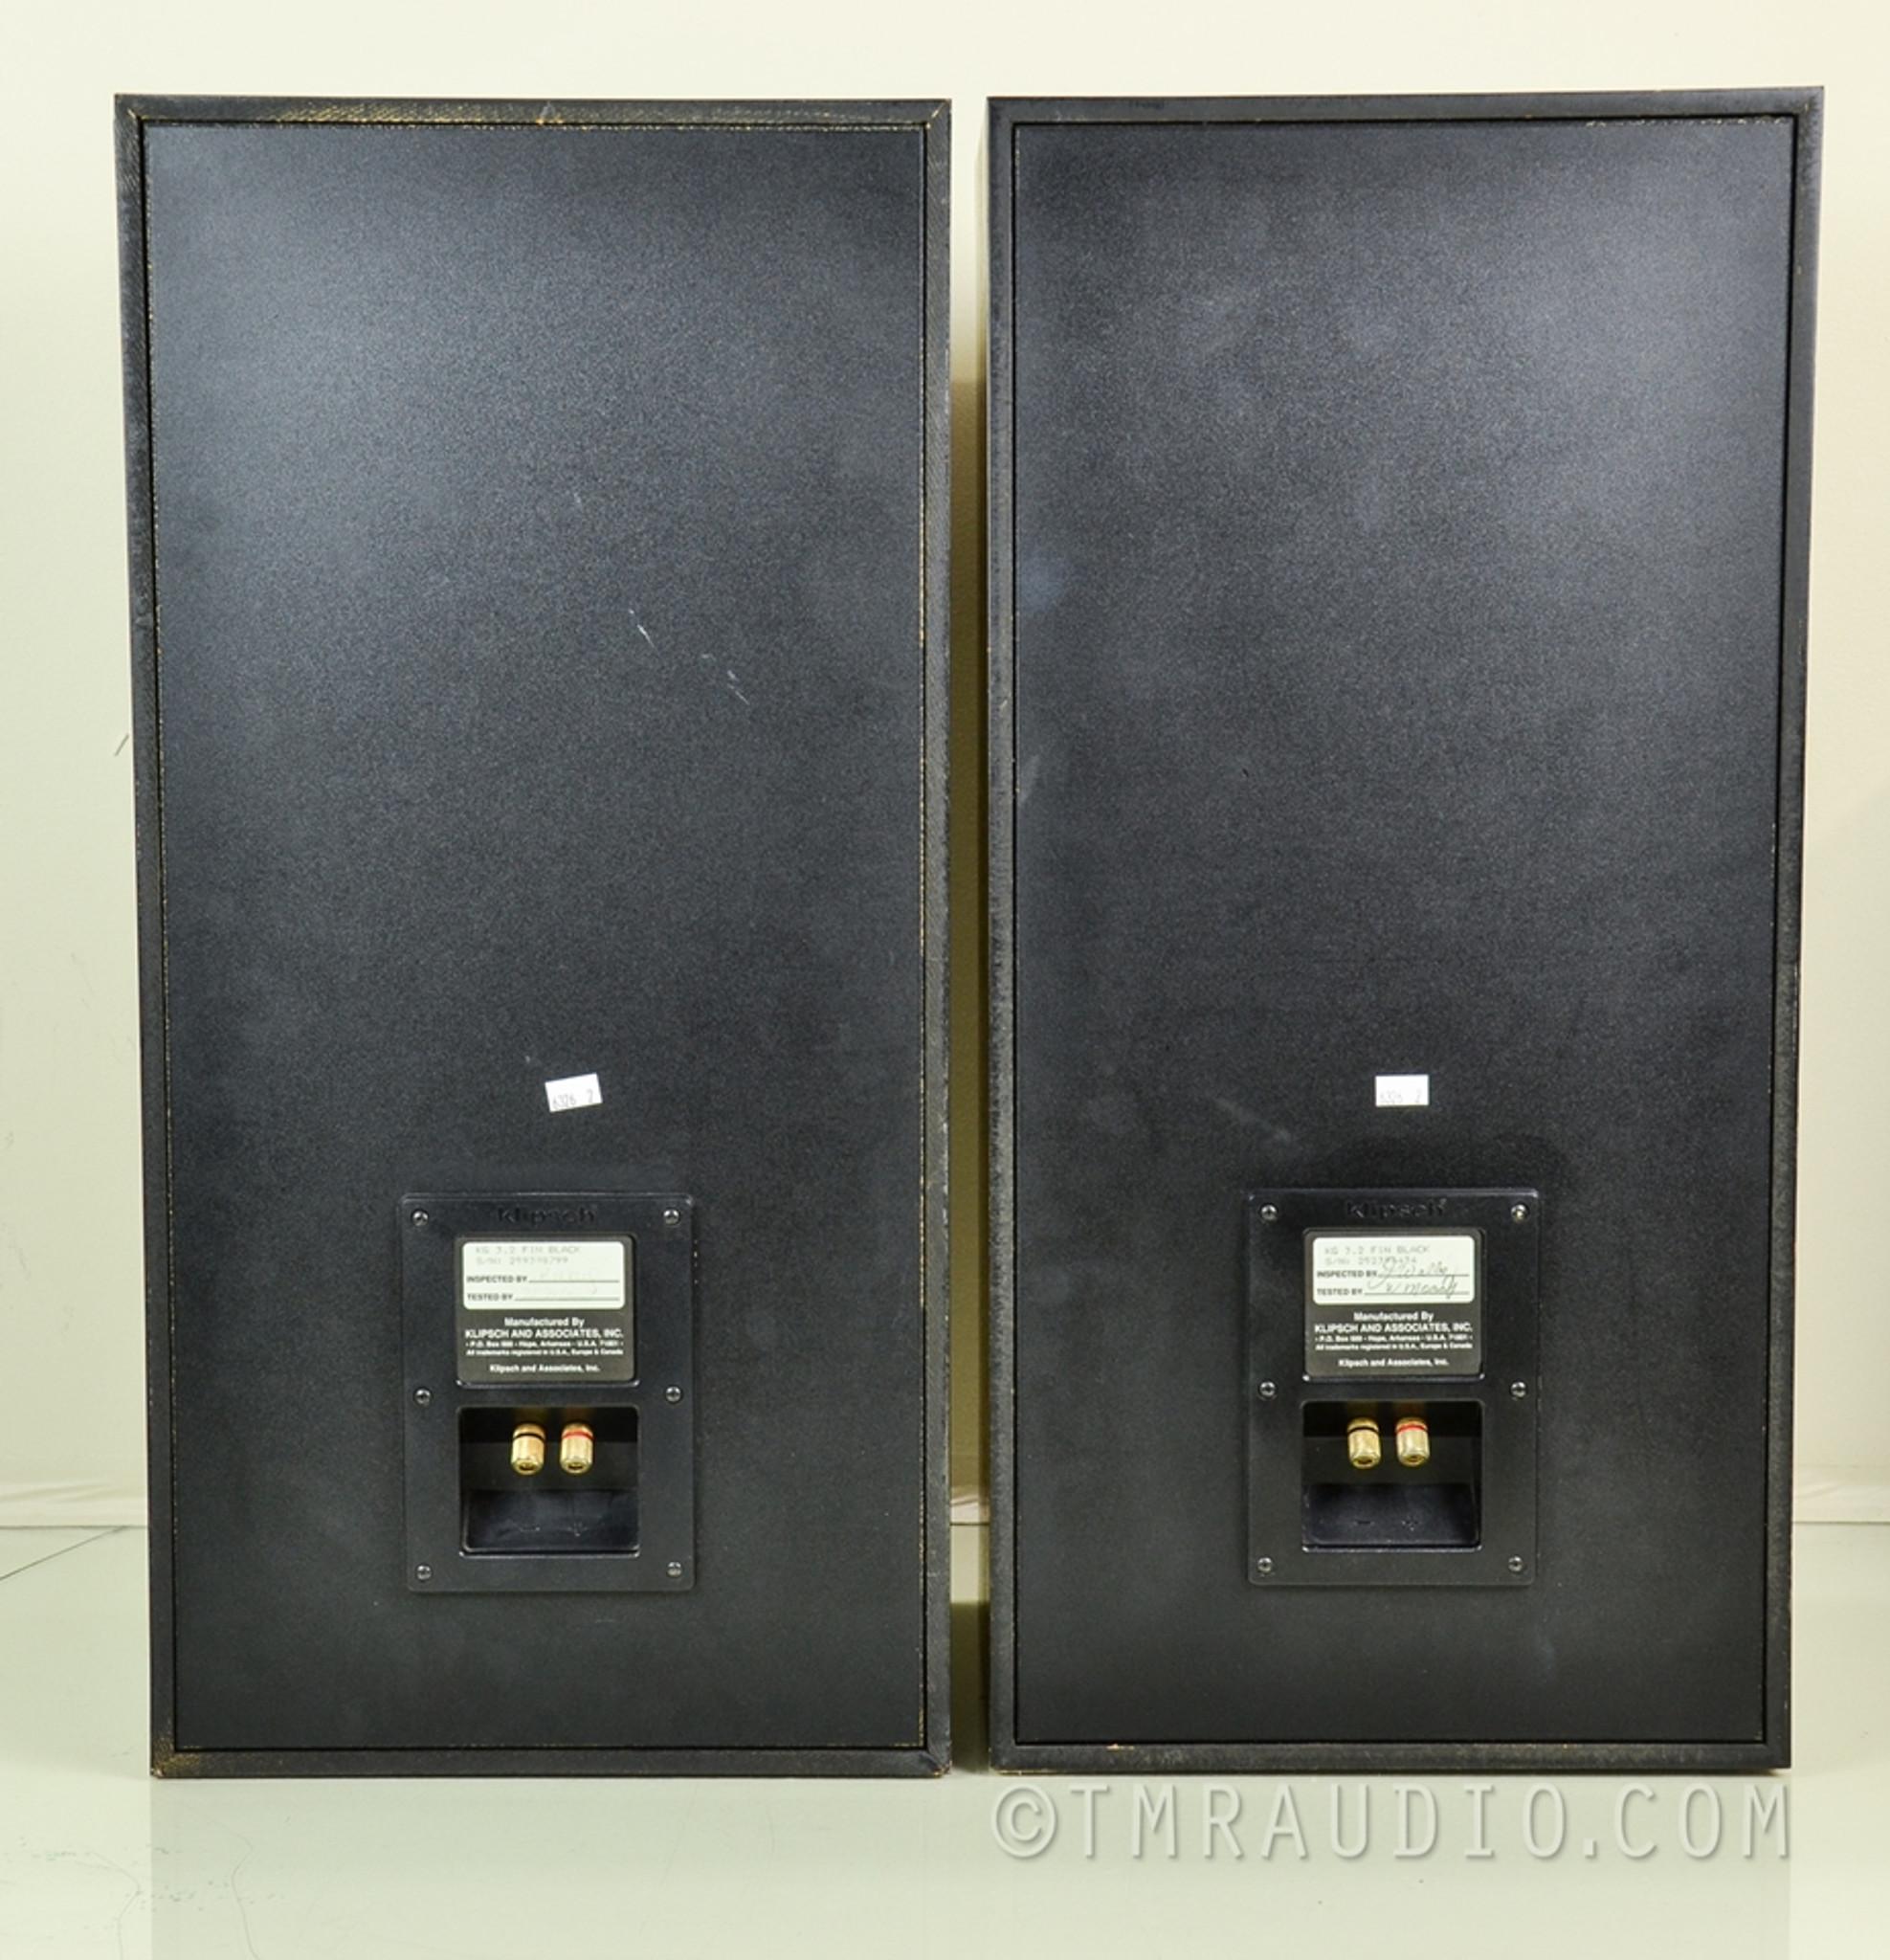 Klipsch KG-3 2 Bookshelf / Floorstanding Speakers